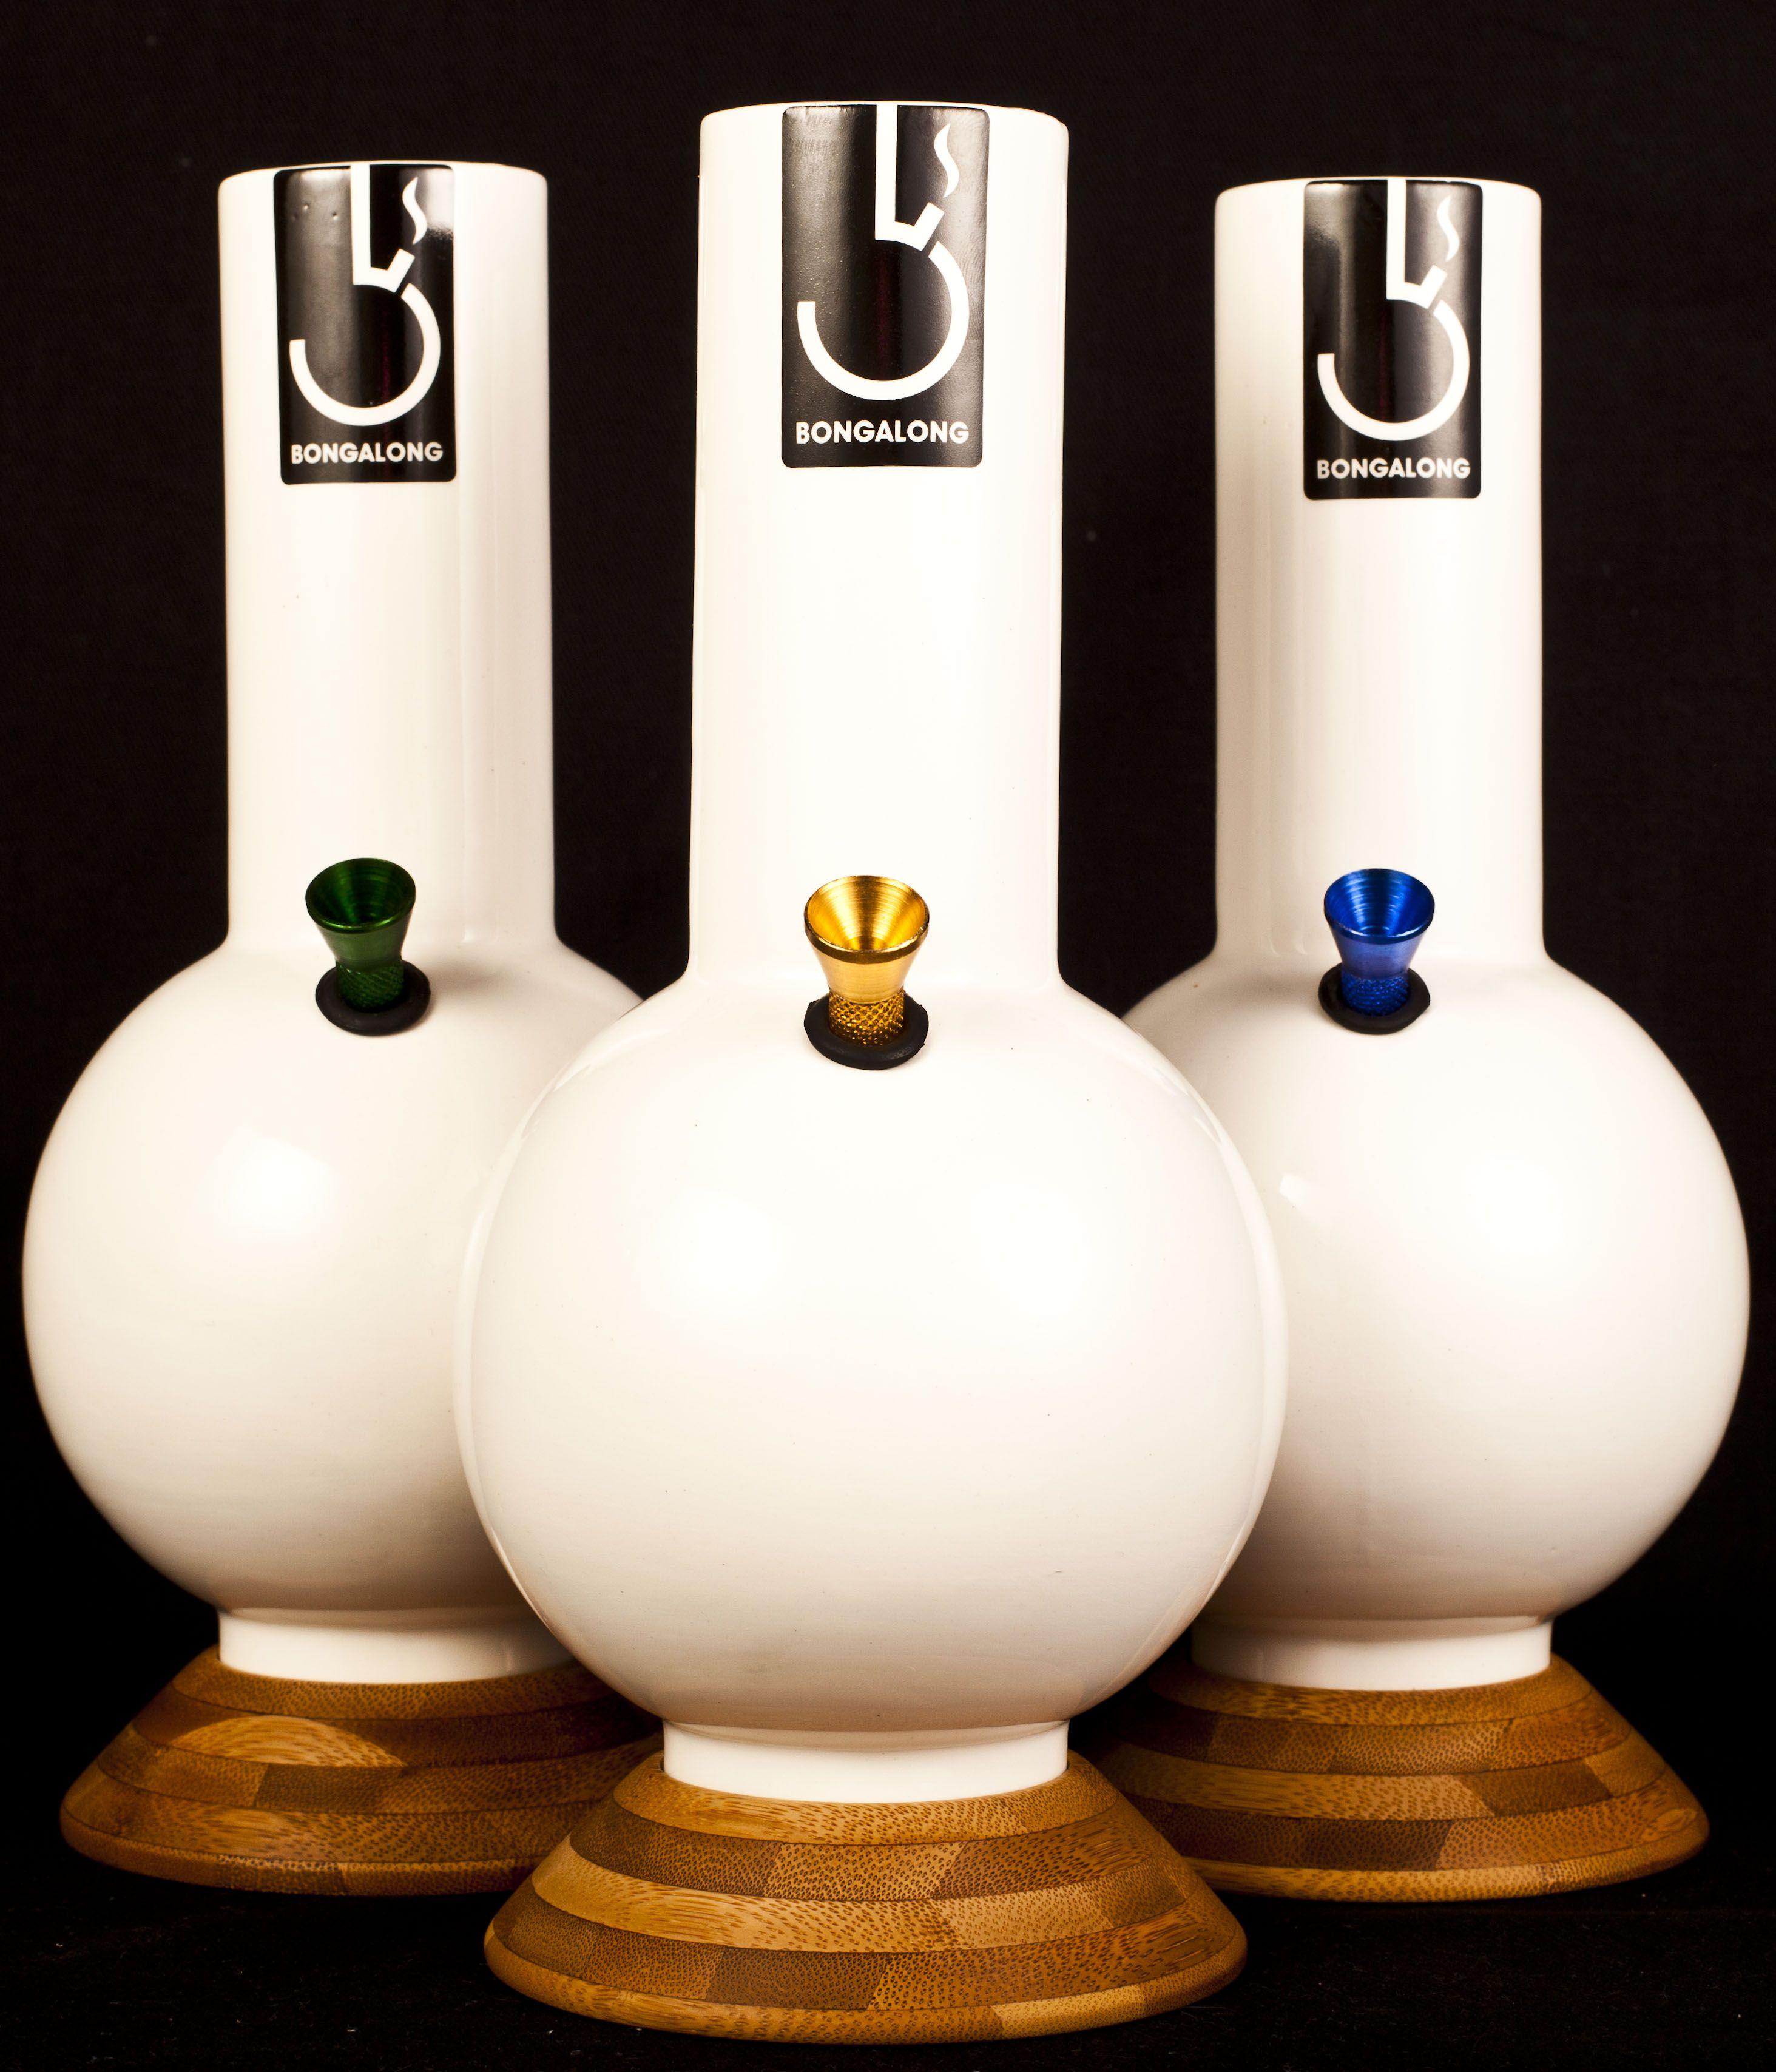 The naughty vase handmade ceramic bongs facebook the naughty vase handmade ceramic bongs facebookbongalonglife reviewsmspy